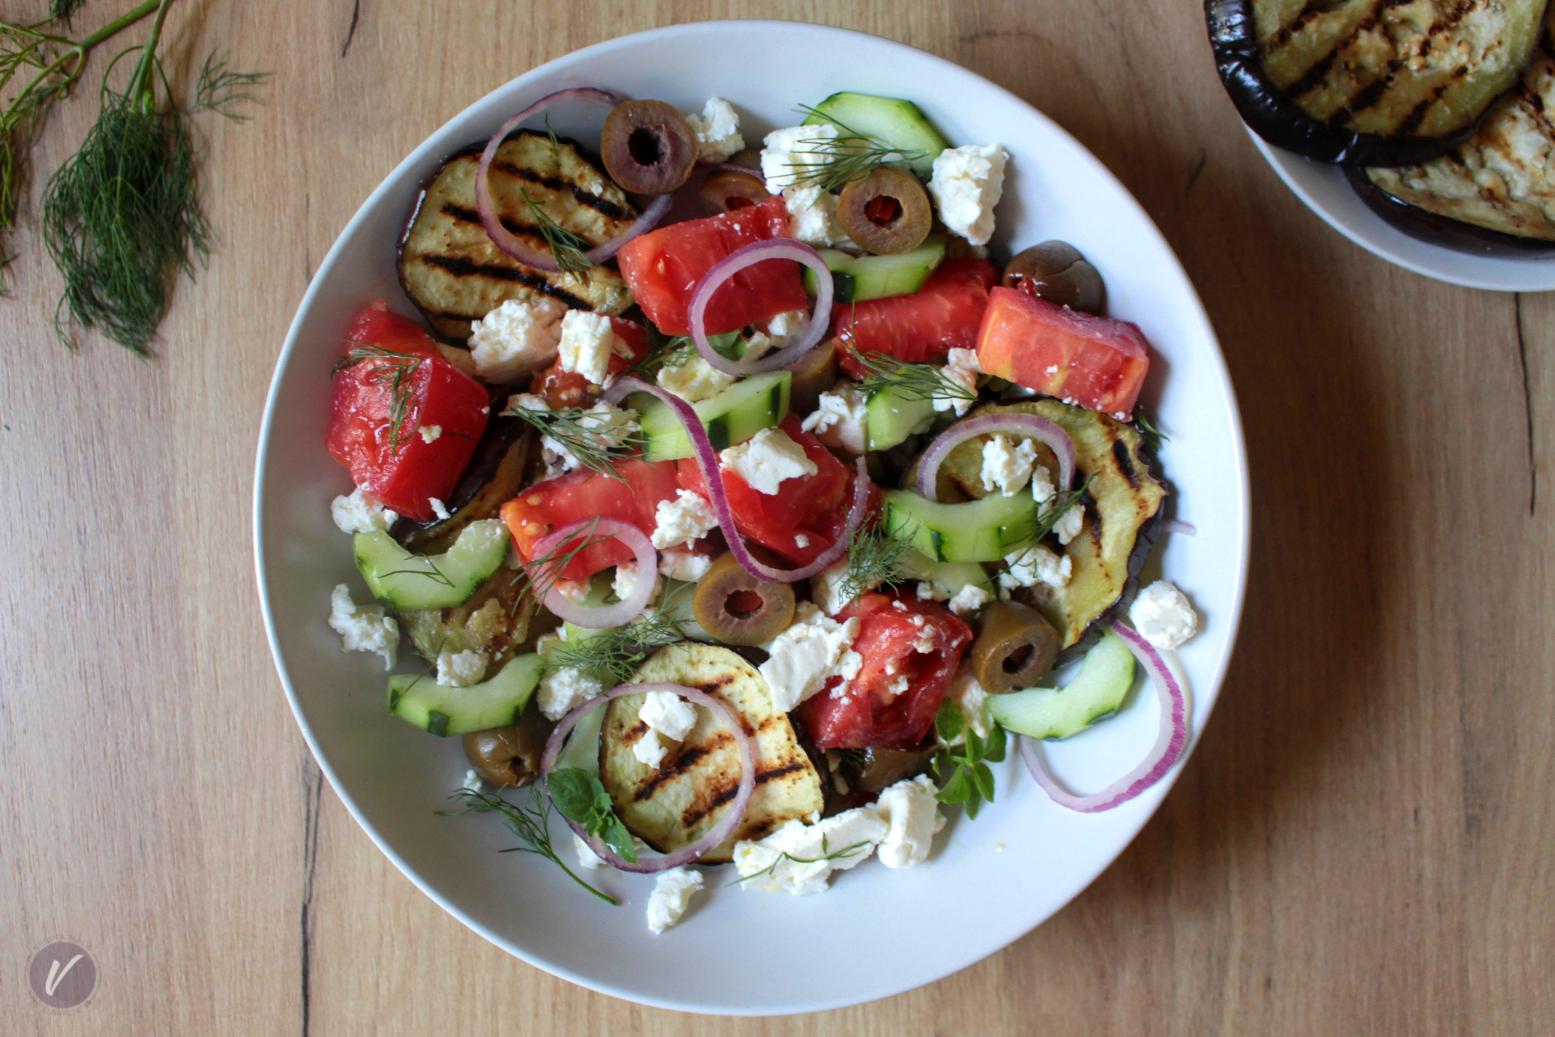 Brza salata sa patlidzanom i mirodjijom